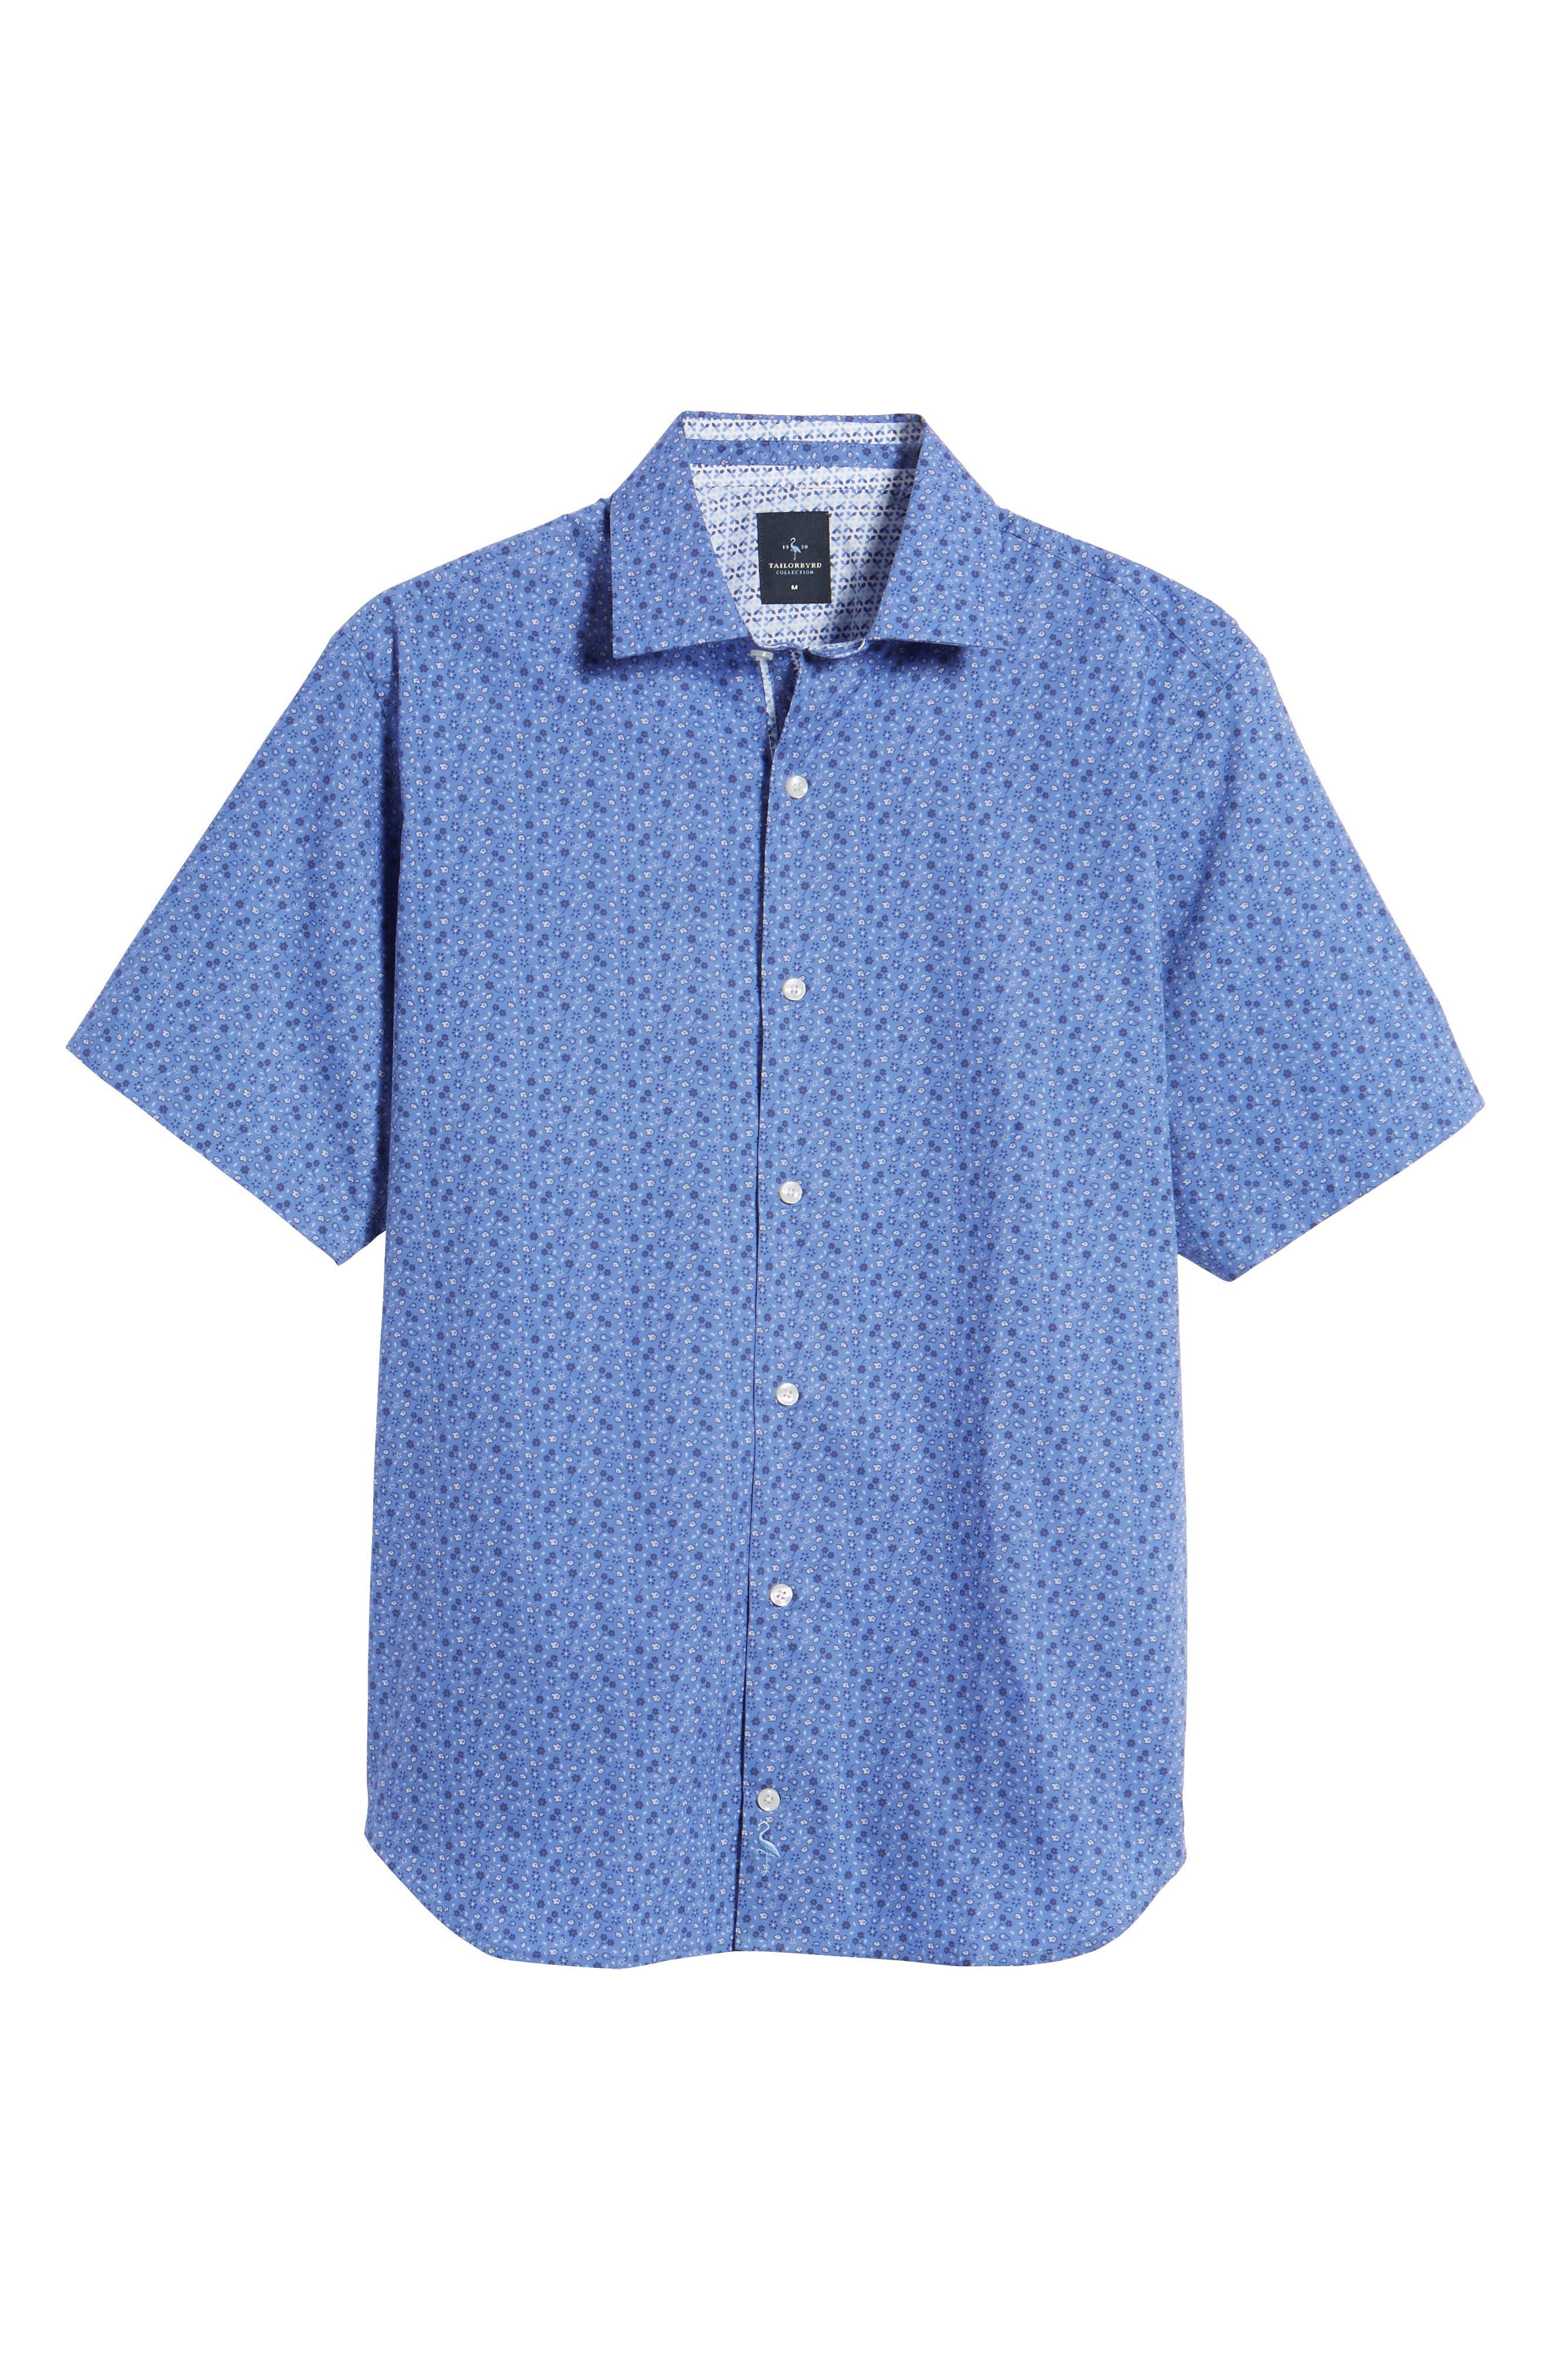 Ballou Regular Fit Floral Print Sport Shirt,                             Alternate thumbnail 6, color,                             Royal